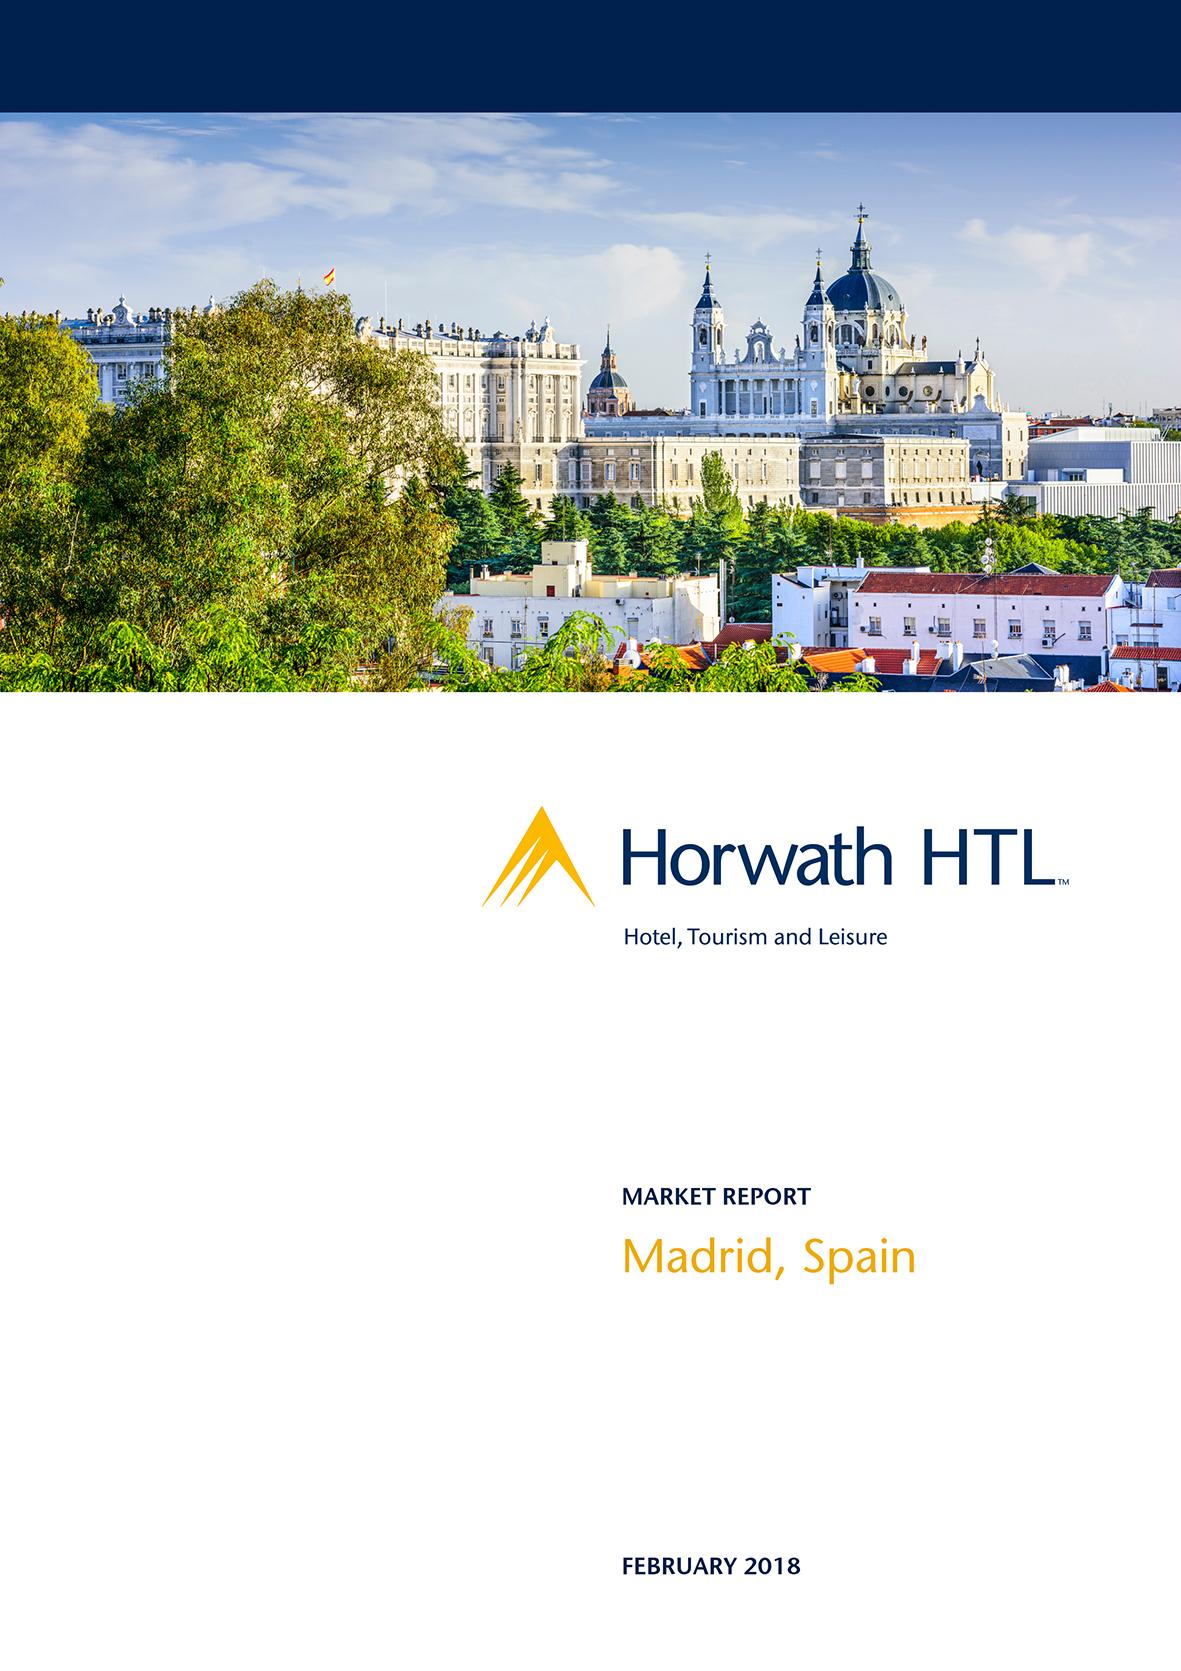 Market Report: Madrid, Spain